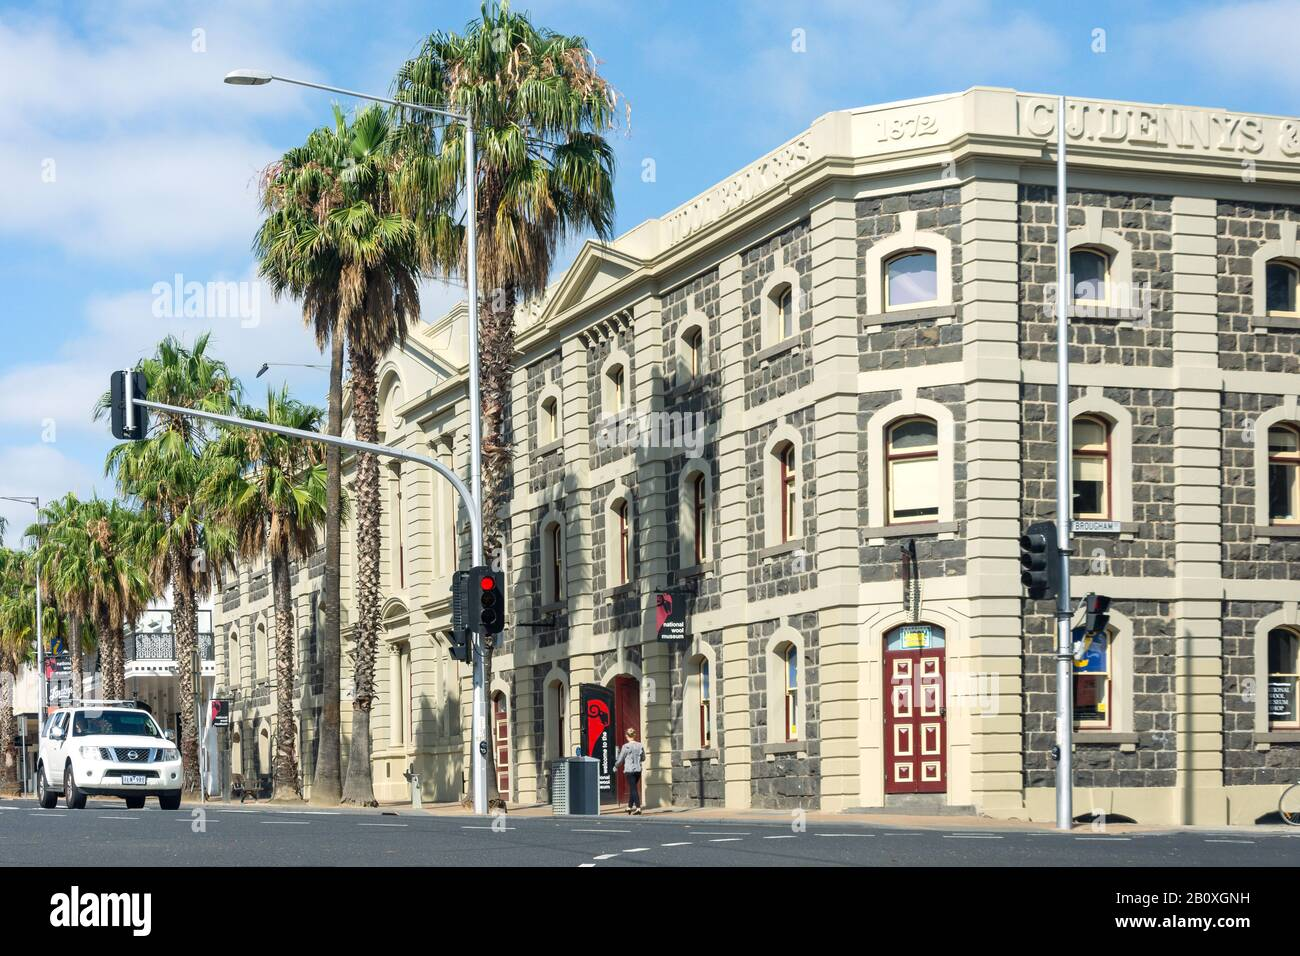 National Wool Museum, Moorabool Street, Geelong, Grant County, Victoria, Australia Stock Photo